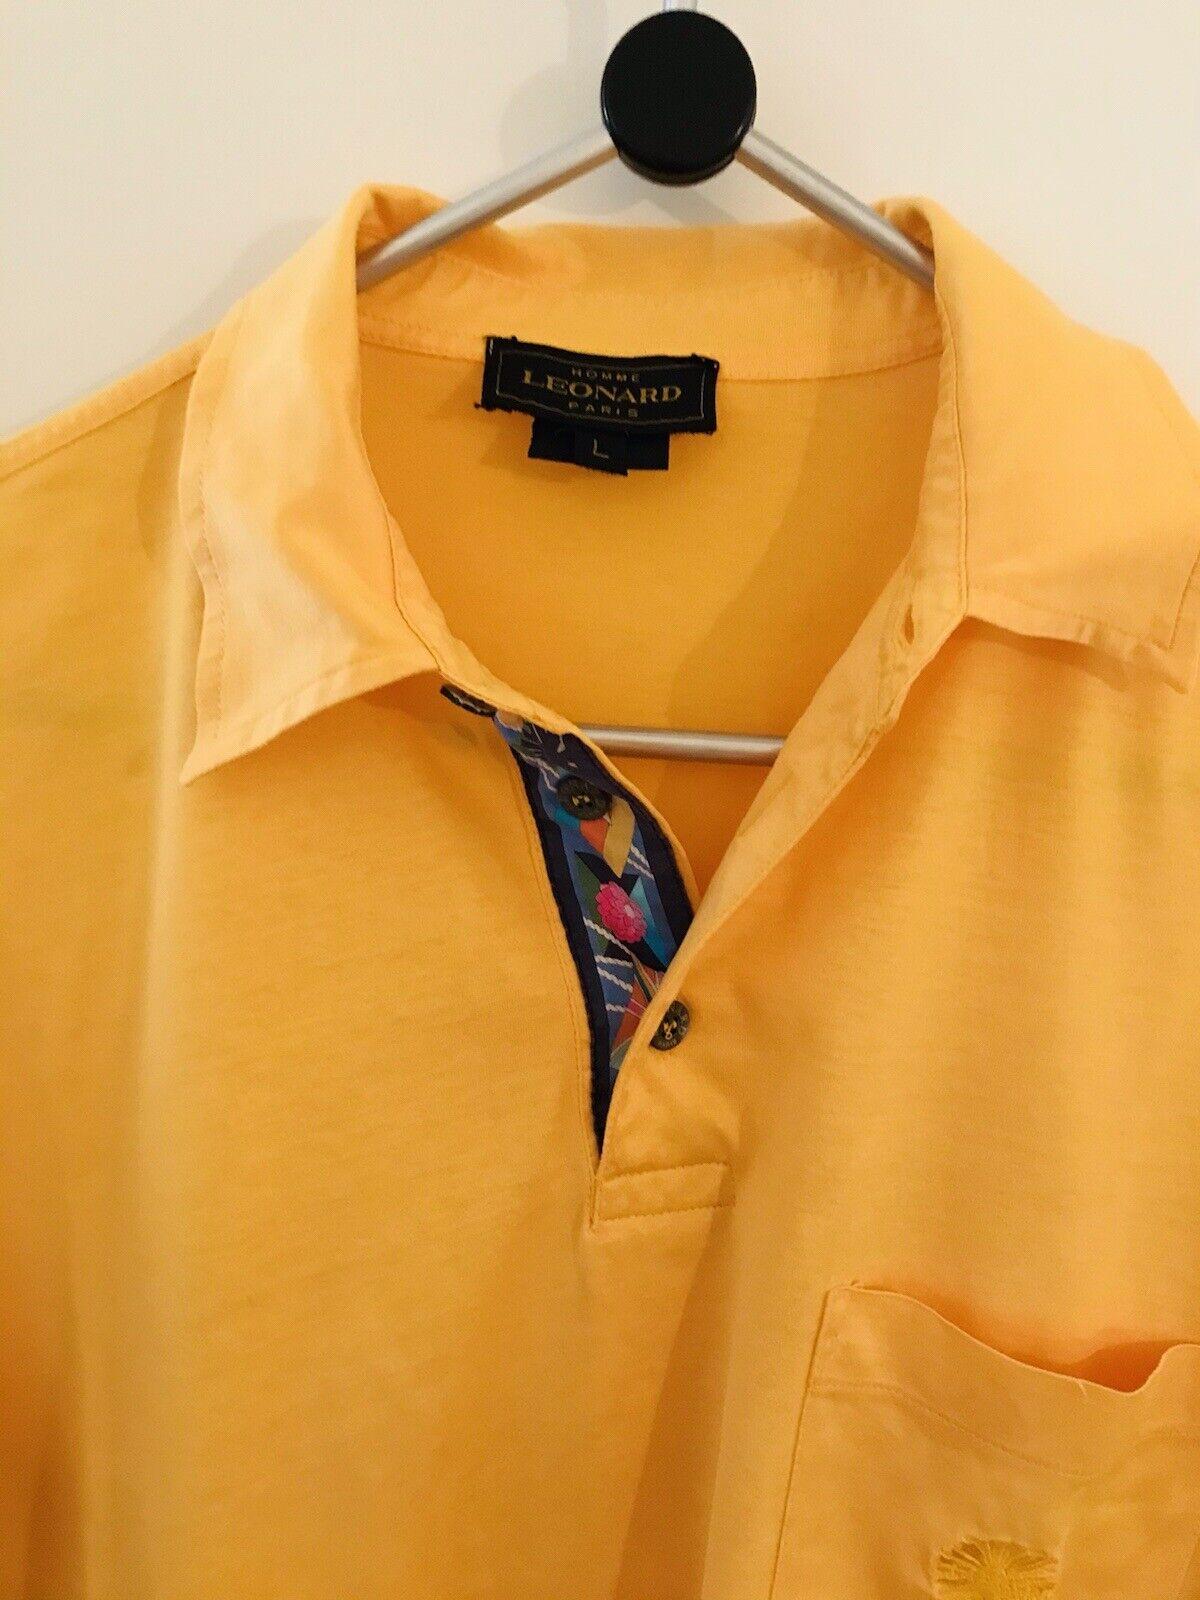 LEONARD Homme Paris Herren Shirt in L